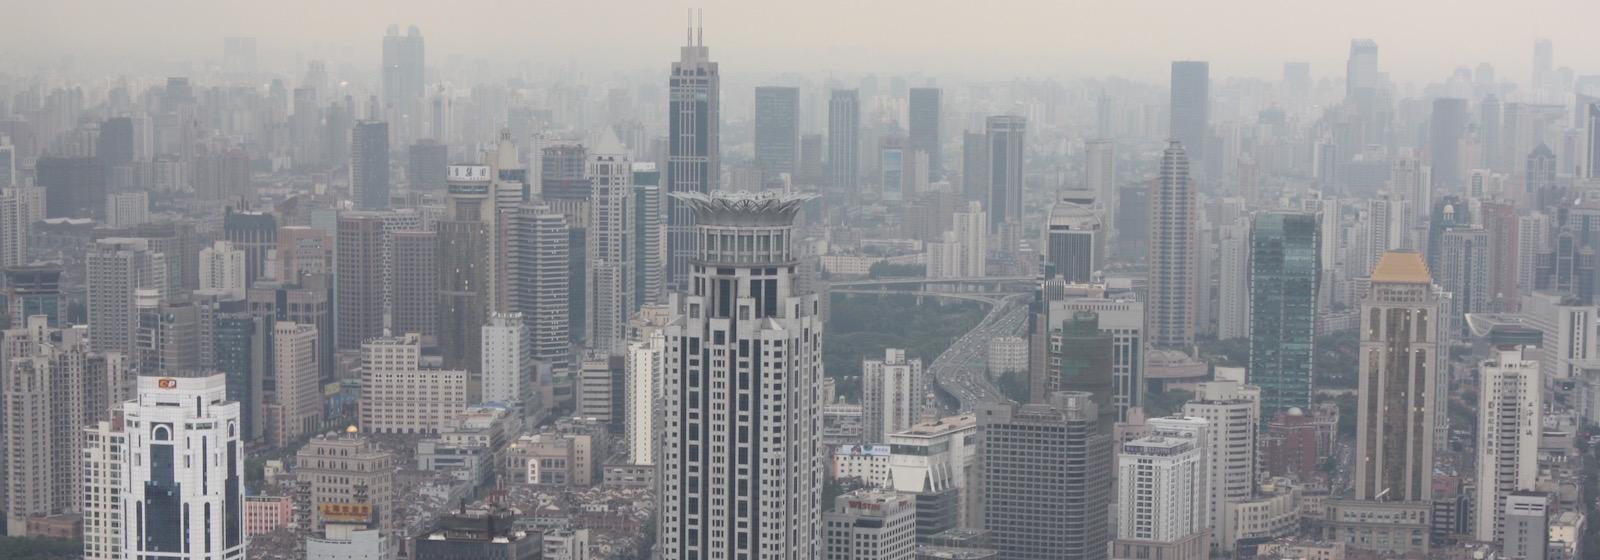 Такой разный Шанхай